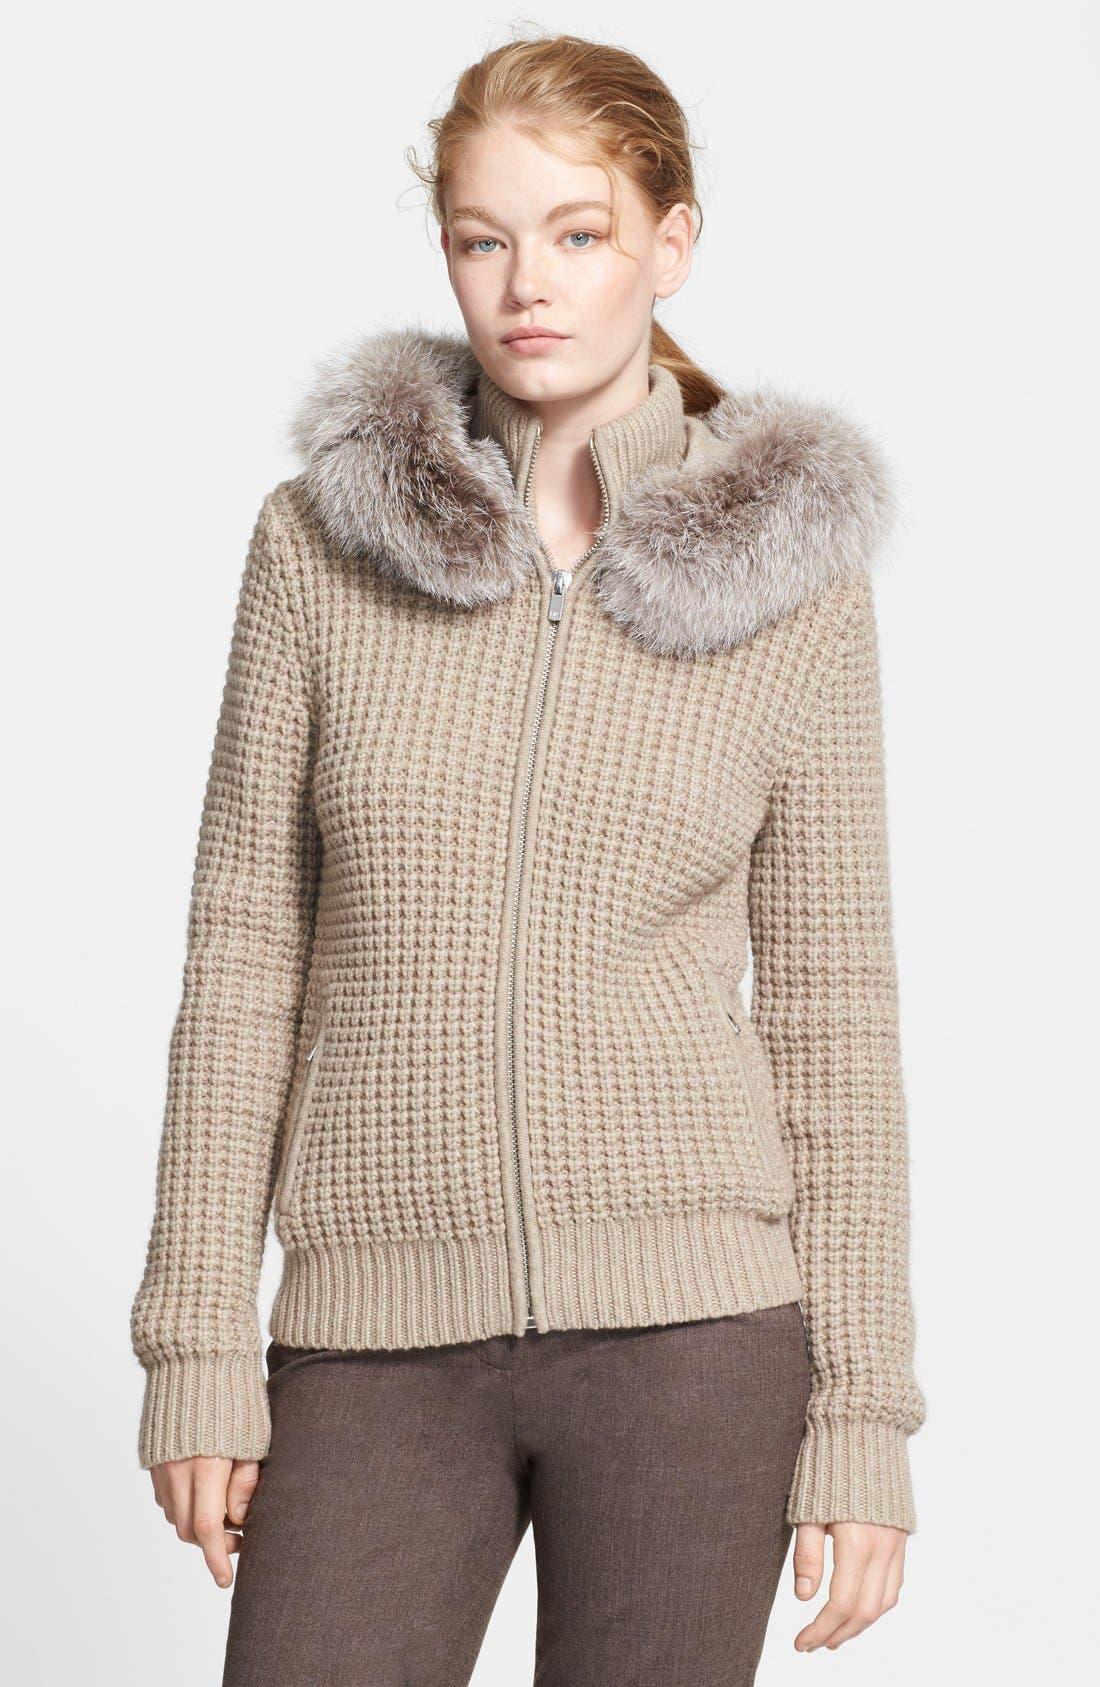 Main Image - Michael Kors Zip Front Cashmere Hoodie with Genuine Fox Fur Trim